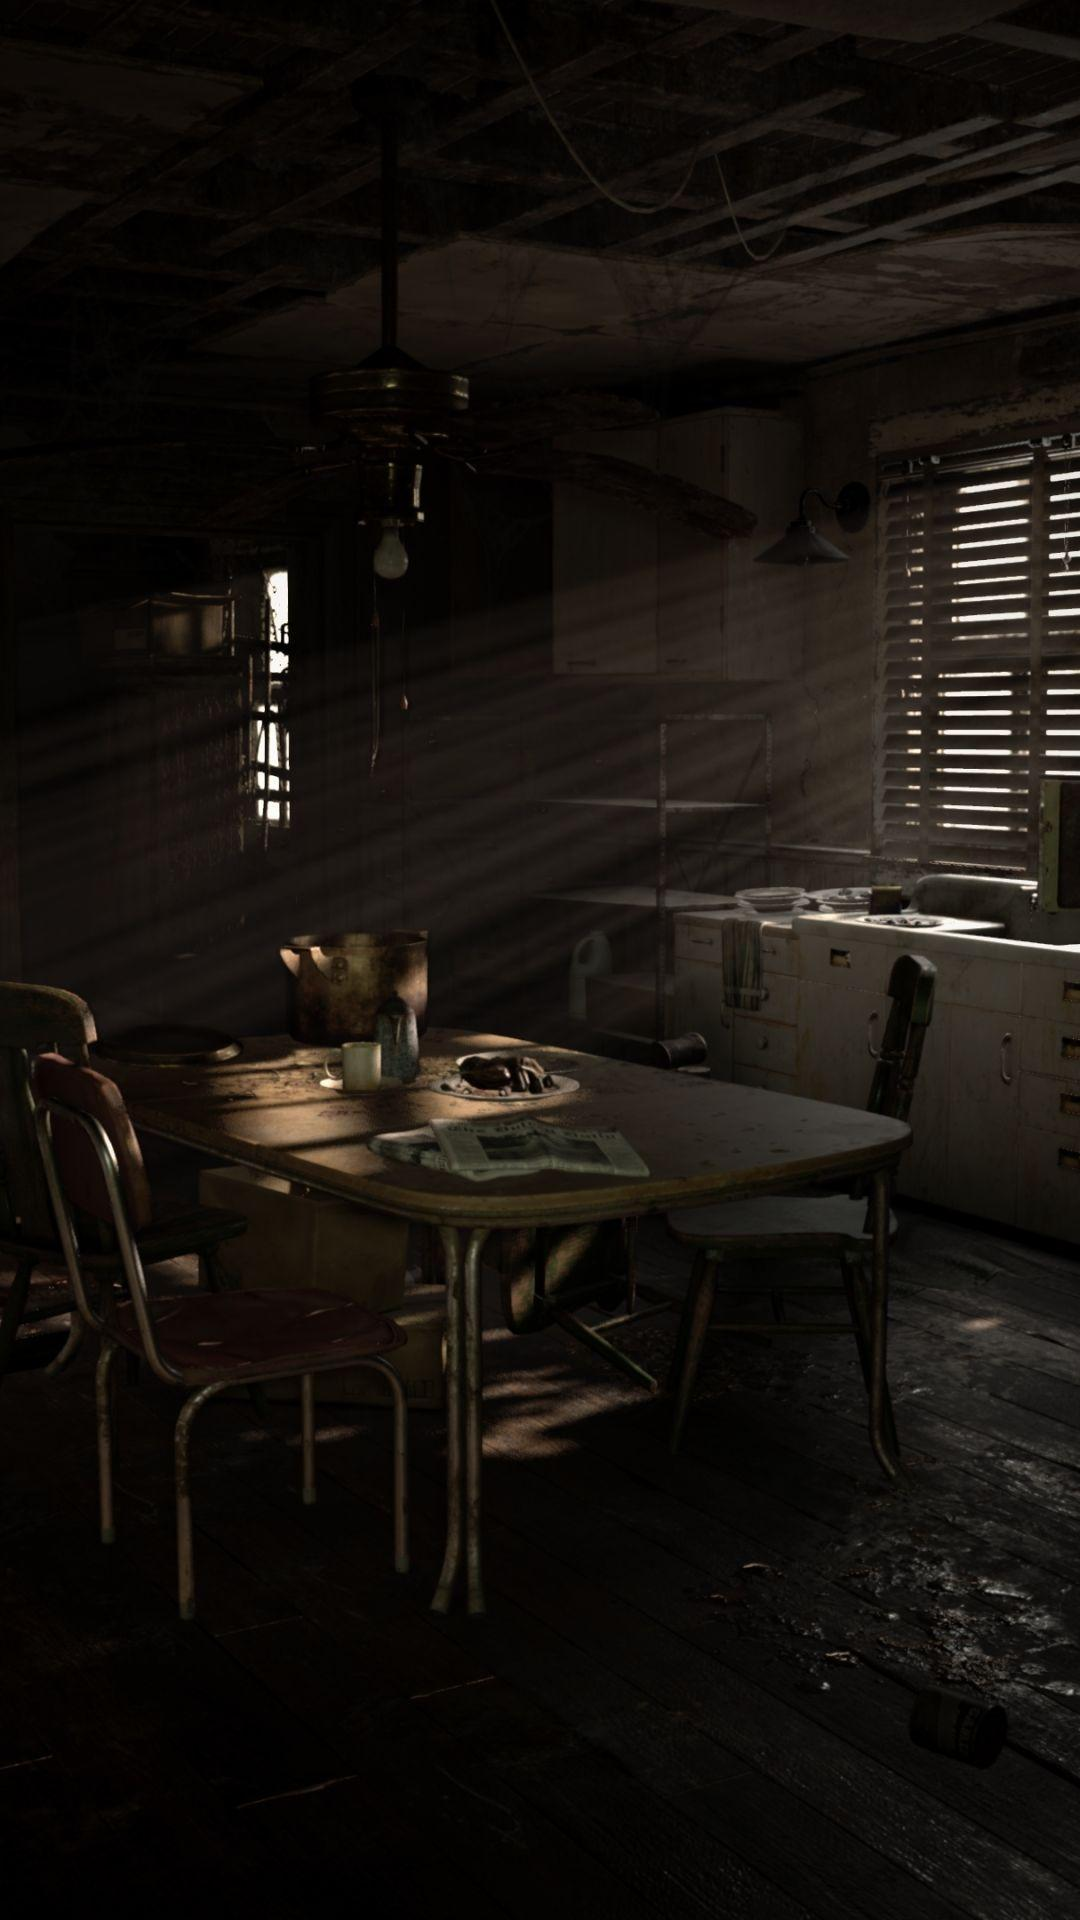 Resident Evil 7: Biohazard Wallpapers - Wallpaper Cave